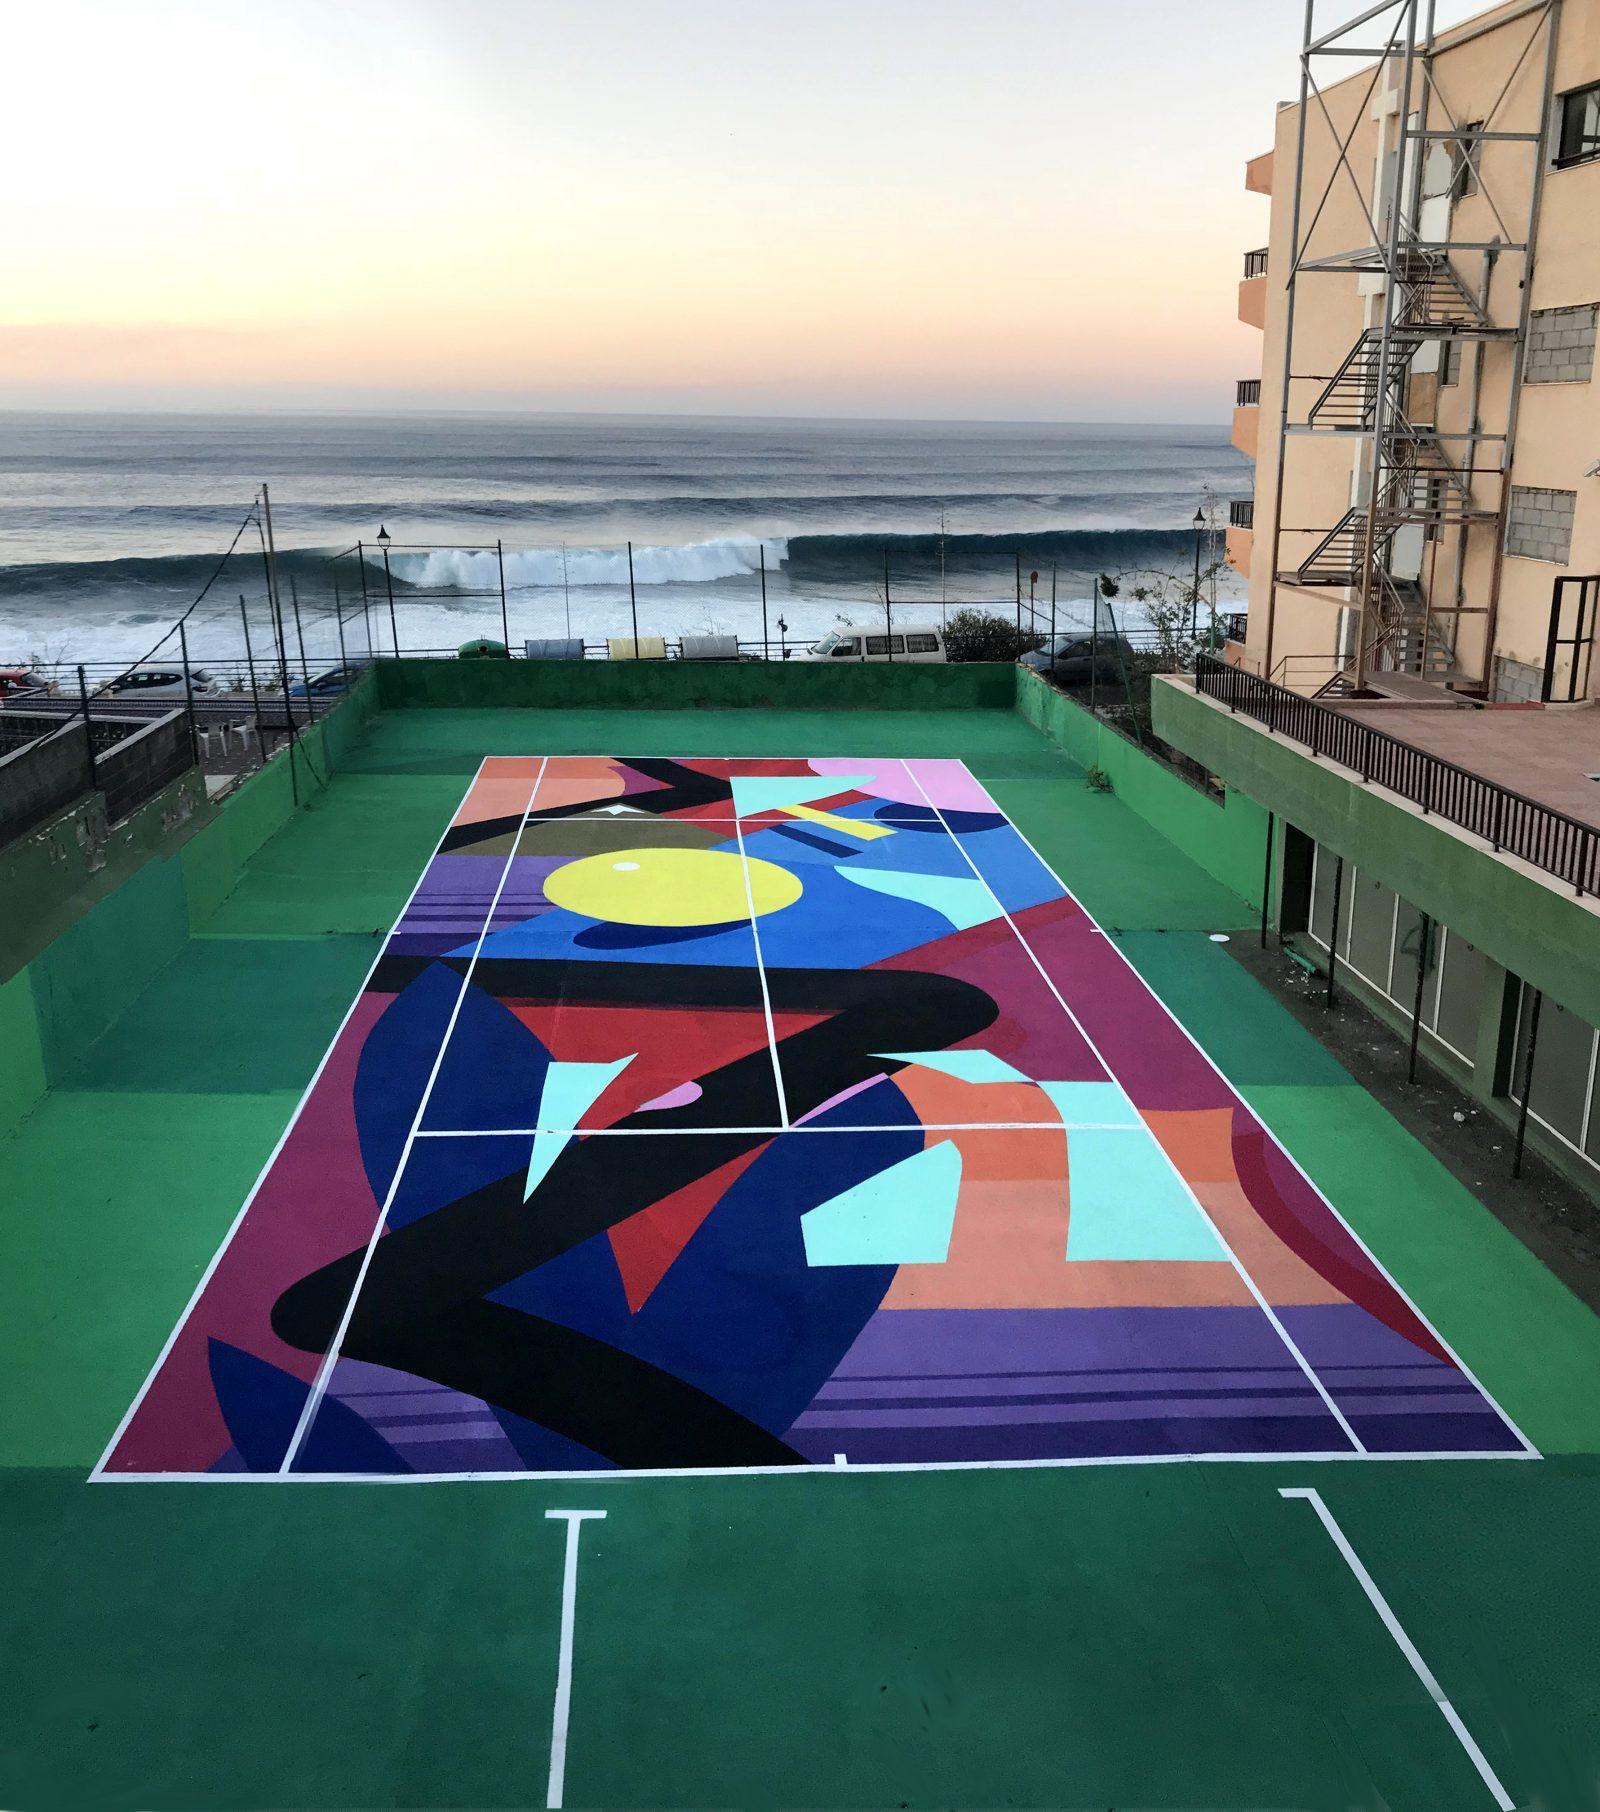 canchaiker muro - sports courts 1